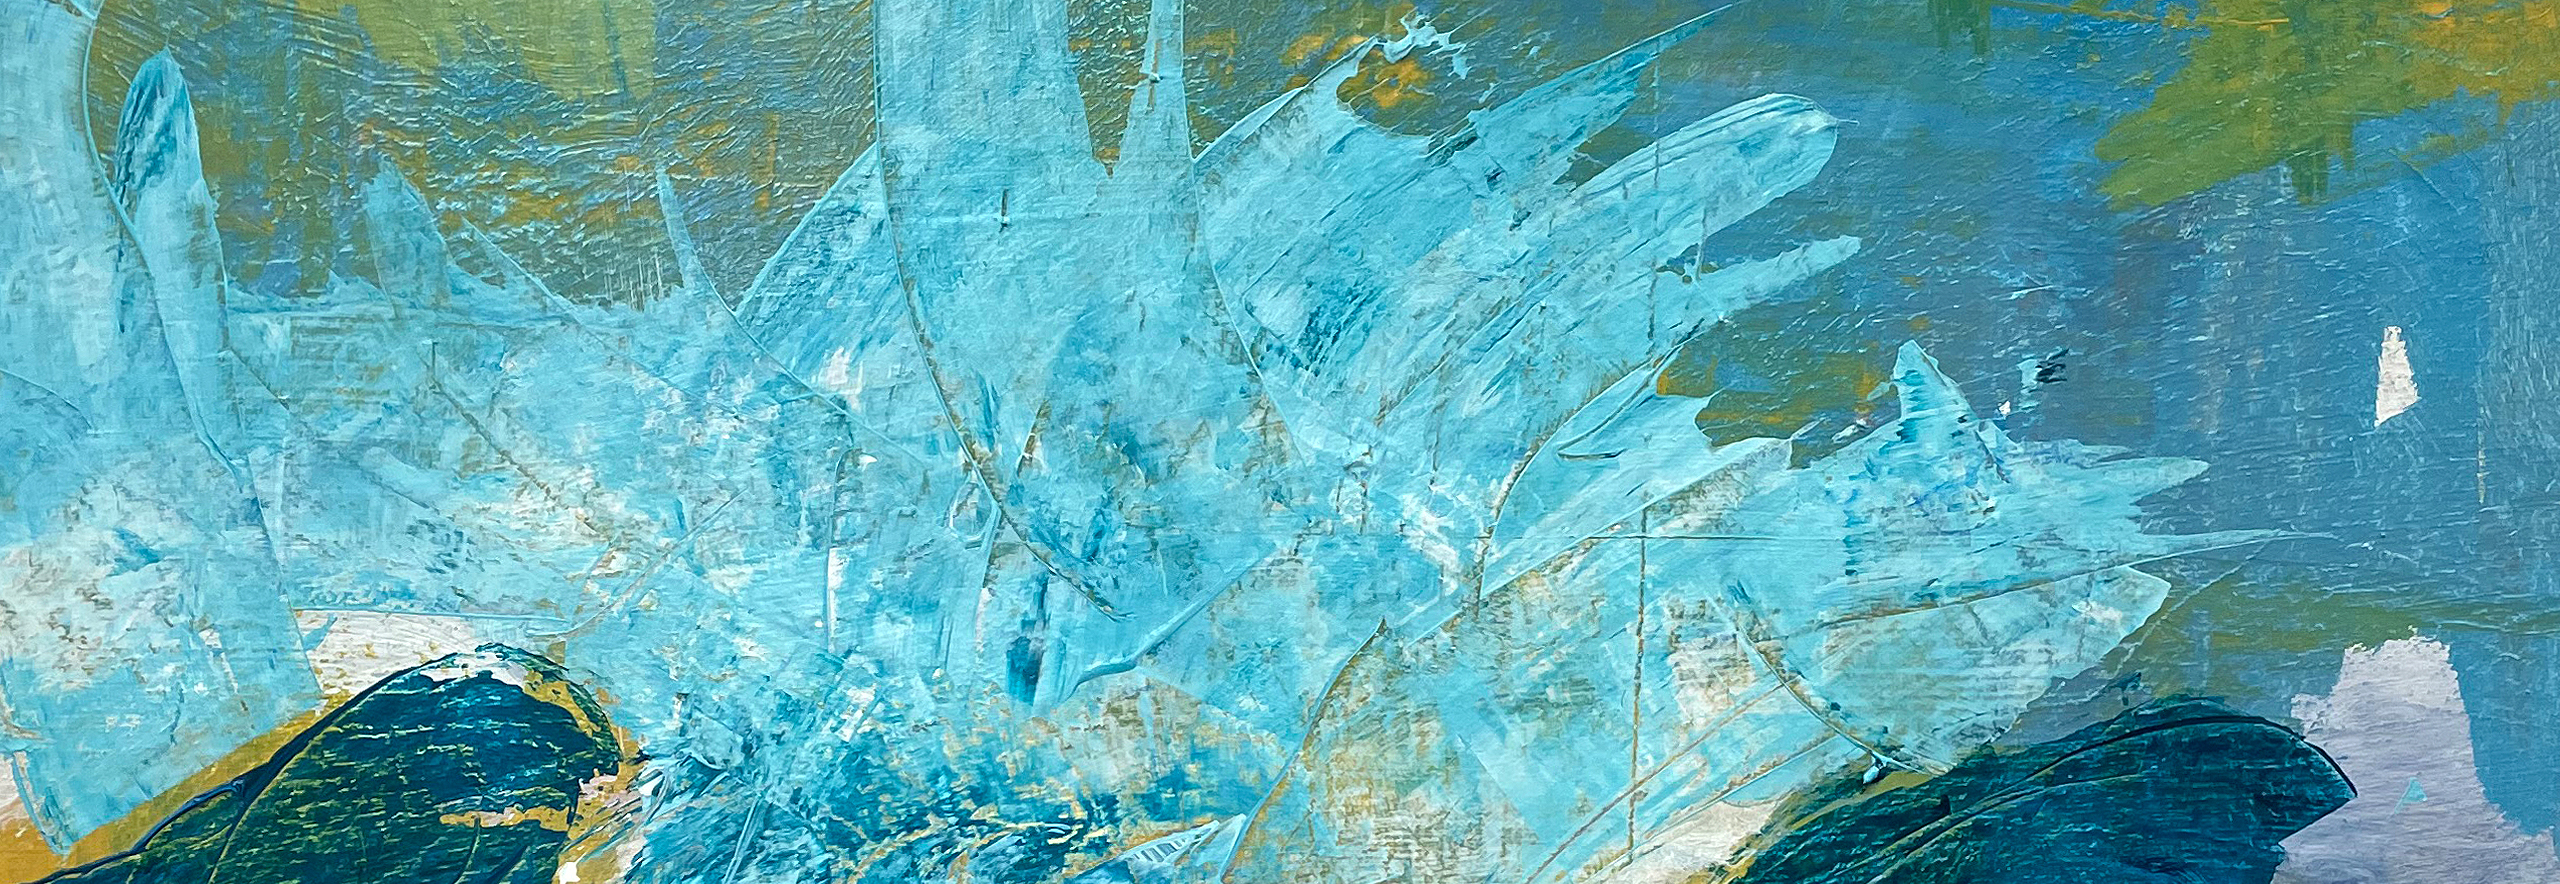 "Über Sylvia Gatz. ""Bretagne (Detail)"". 50 x 50 cm. Acryl und Öl auf Leinwand. 2020"